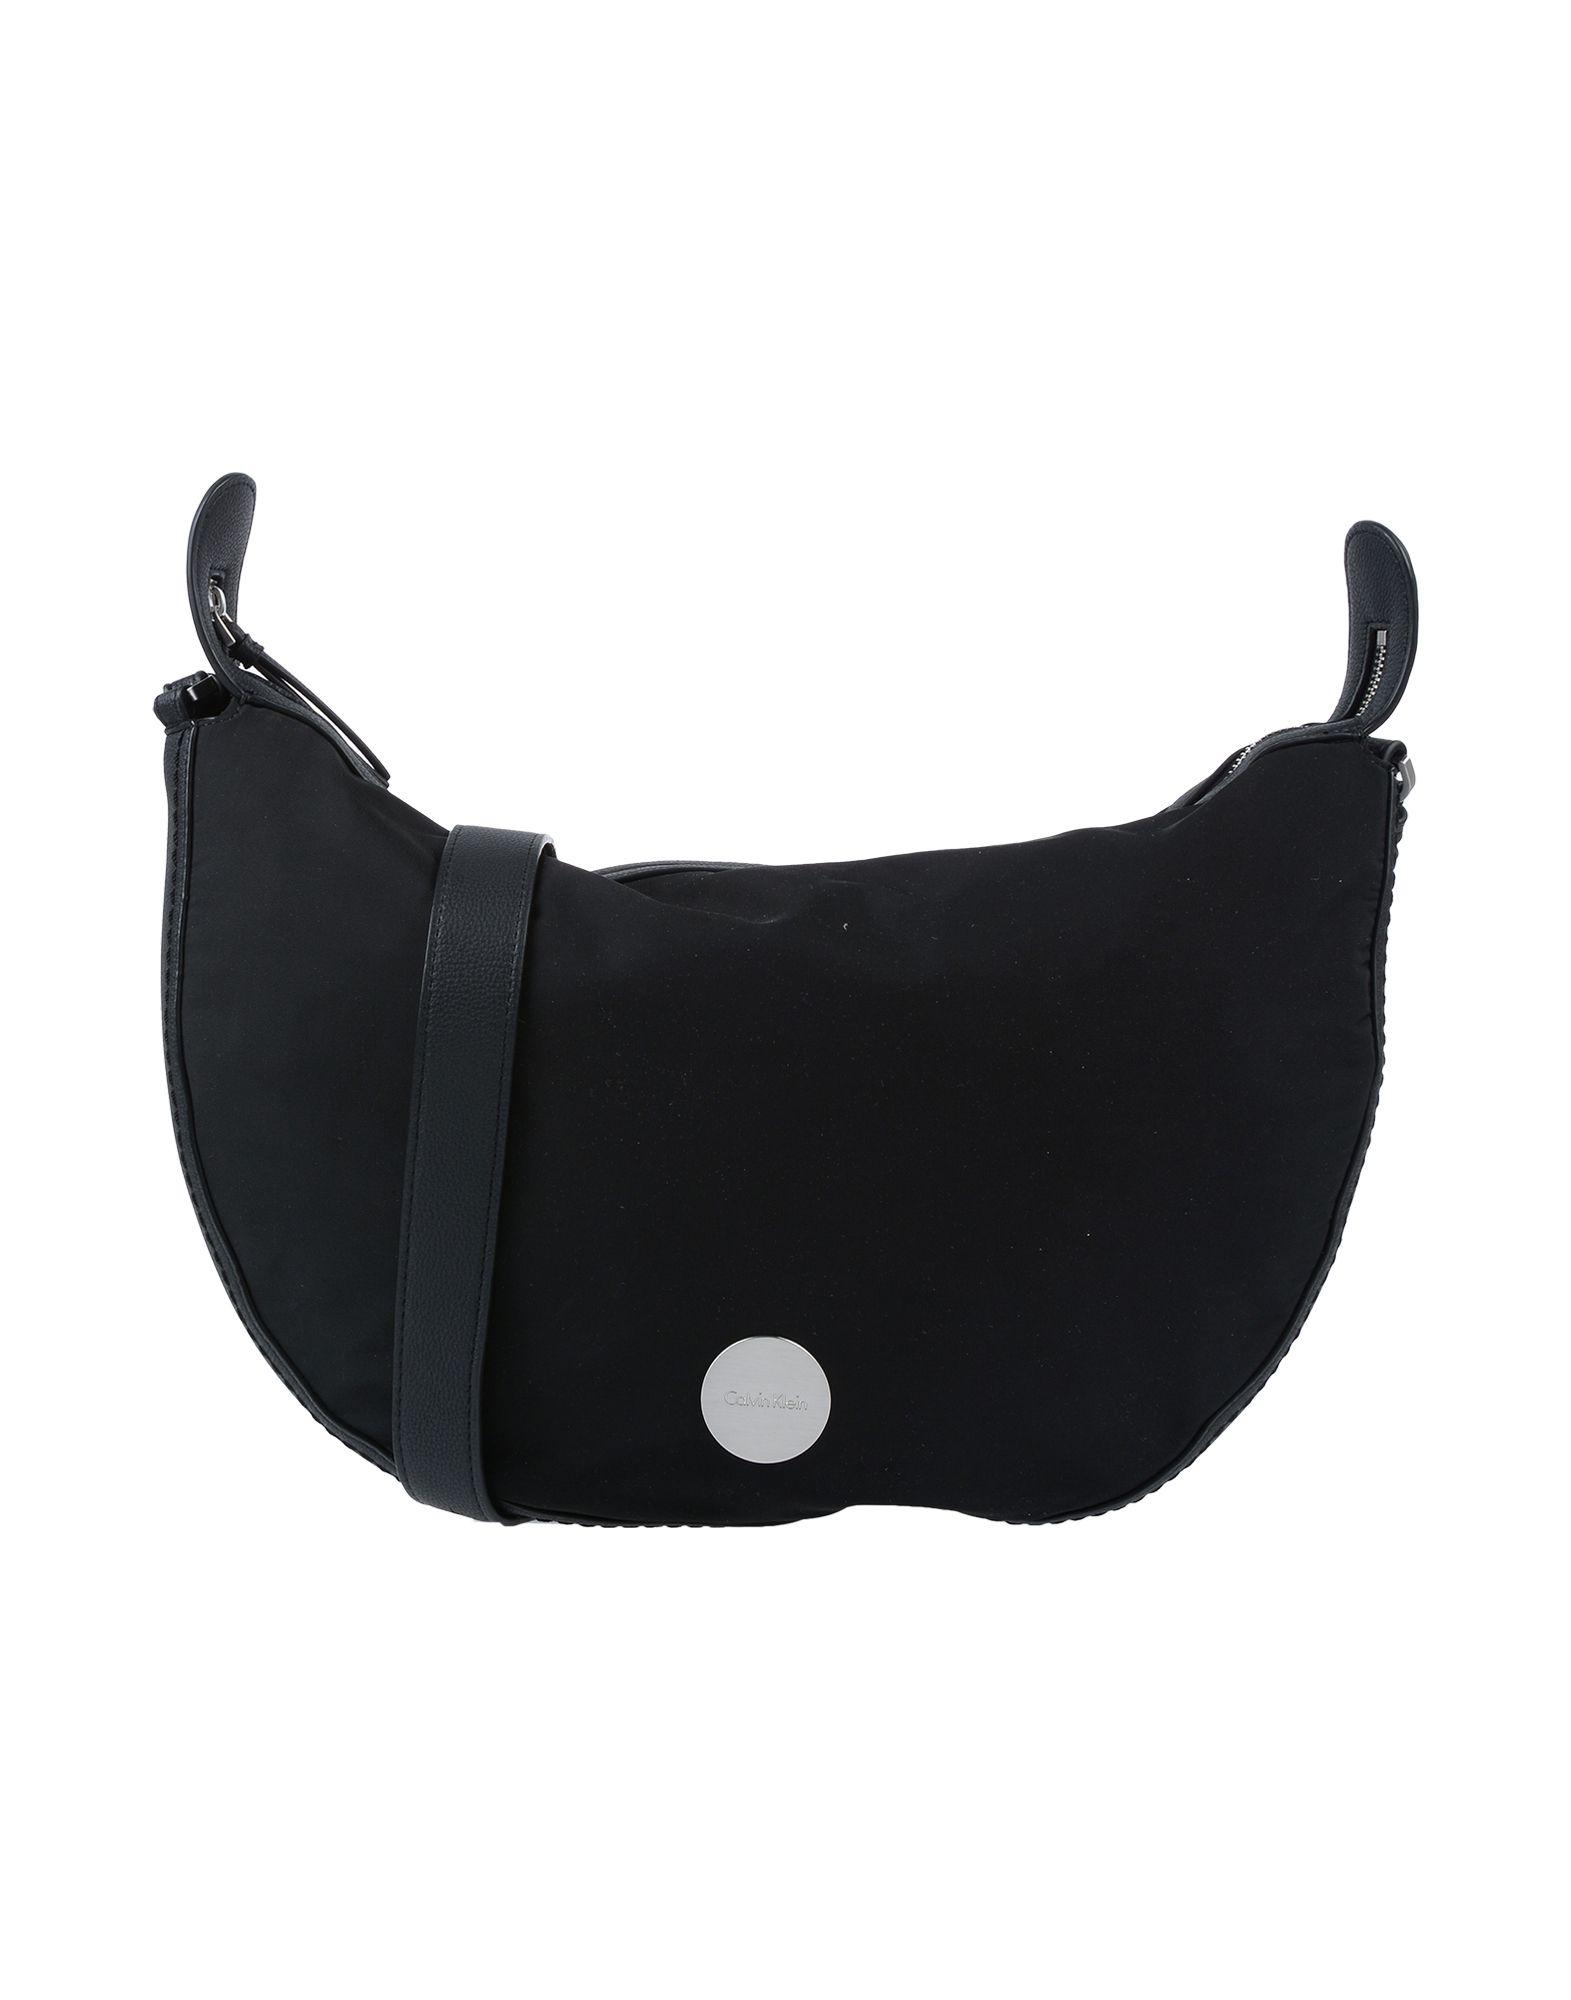 CALVIN KLEIN Сумка через плечо сумка хобо amo la vita jk 92bwc 005 искусственная кожа